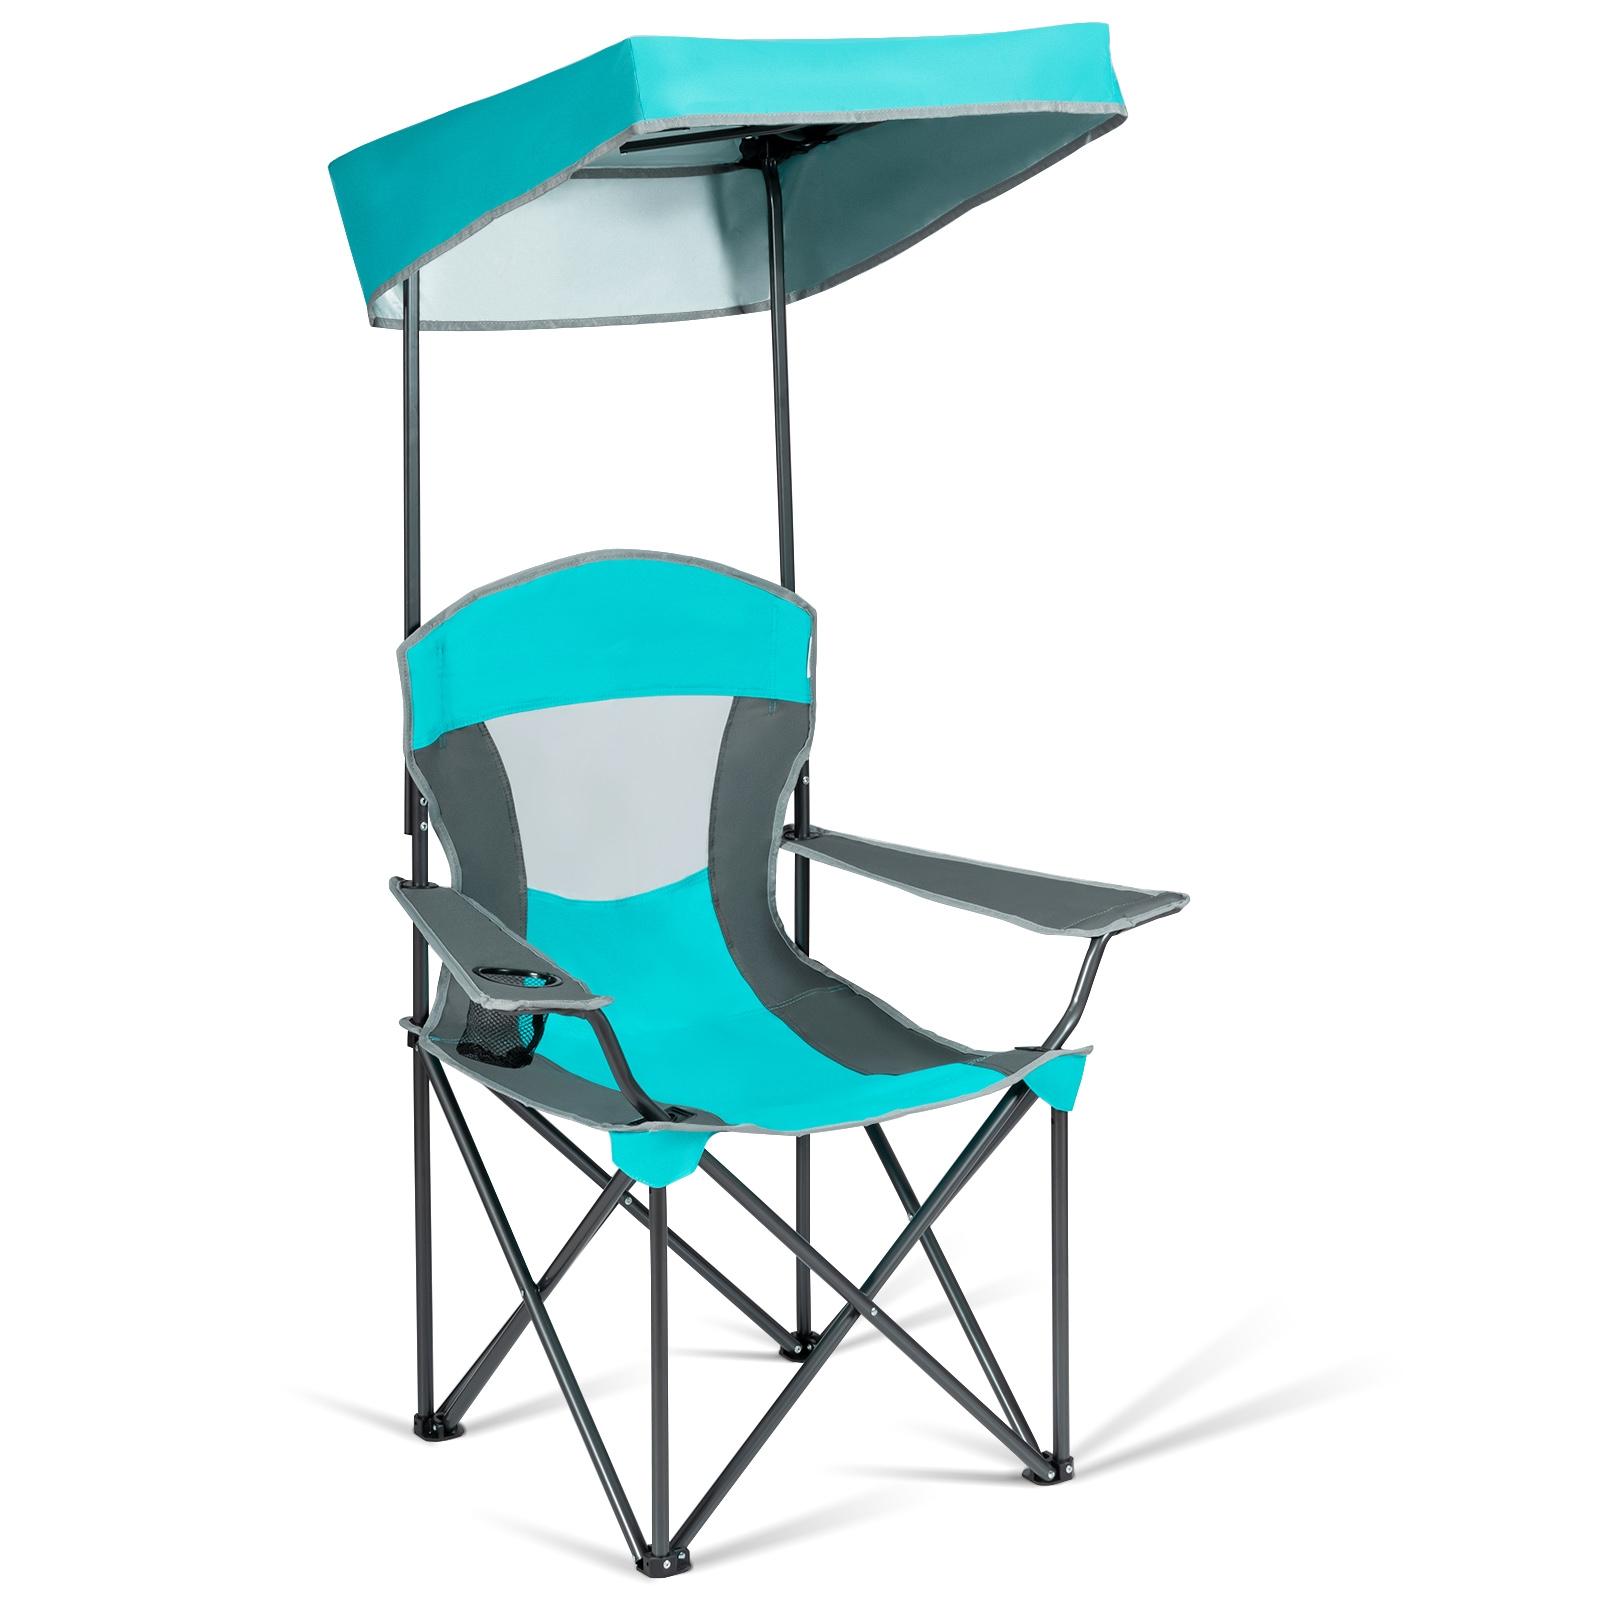 Reliance Tri-to-go chaise camping pliante//Toilettes Portable 9900-10